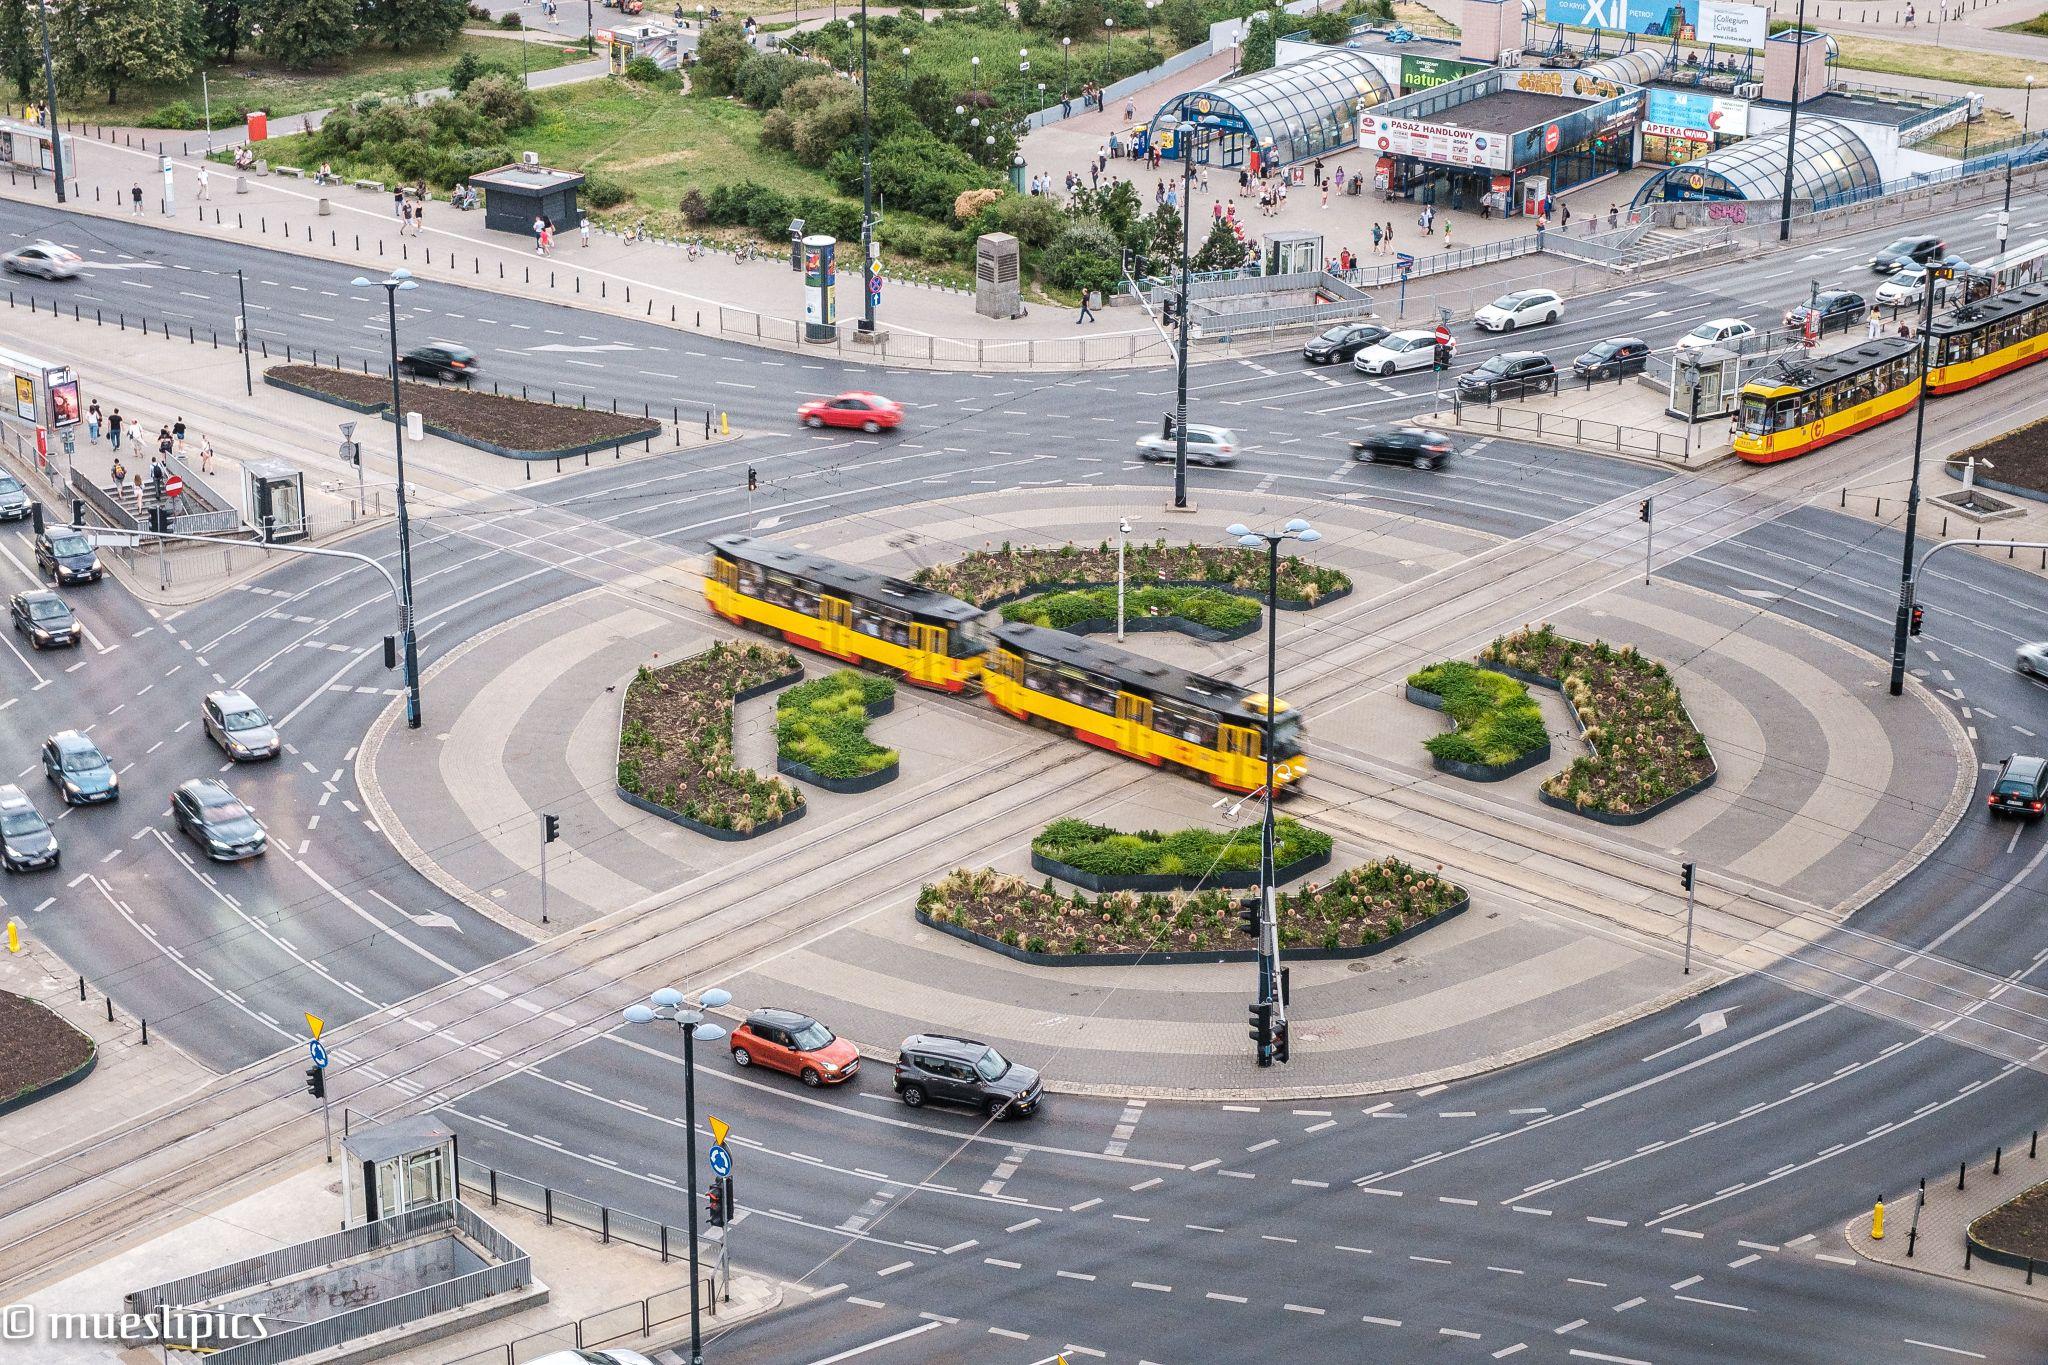 Roundabout Warsaw Centrum / Rondo Dmowskiego, Poland